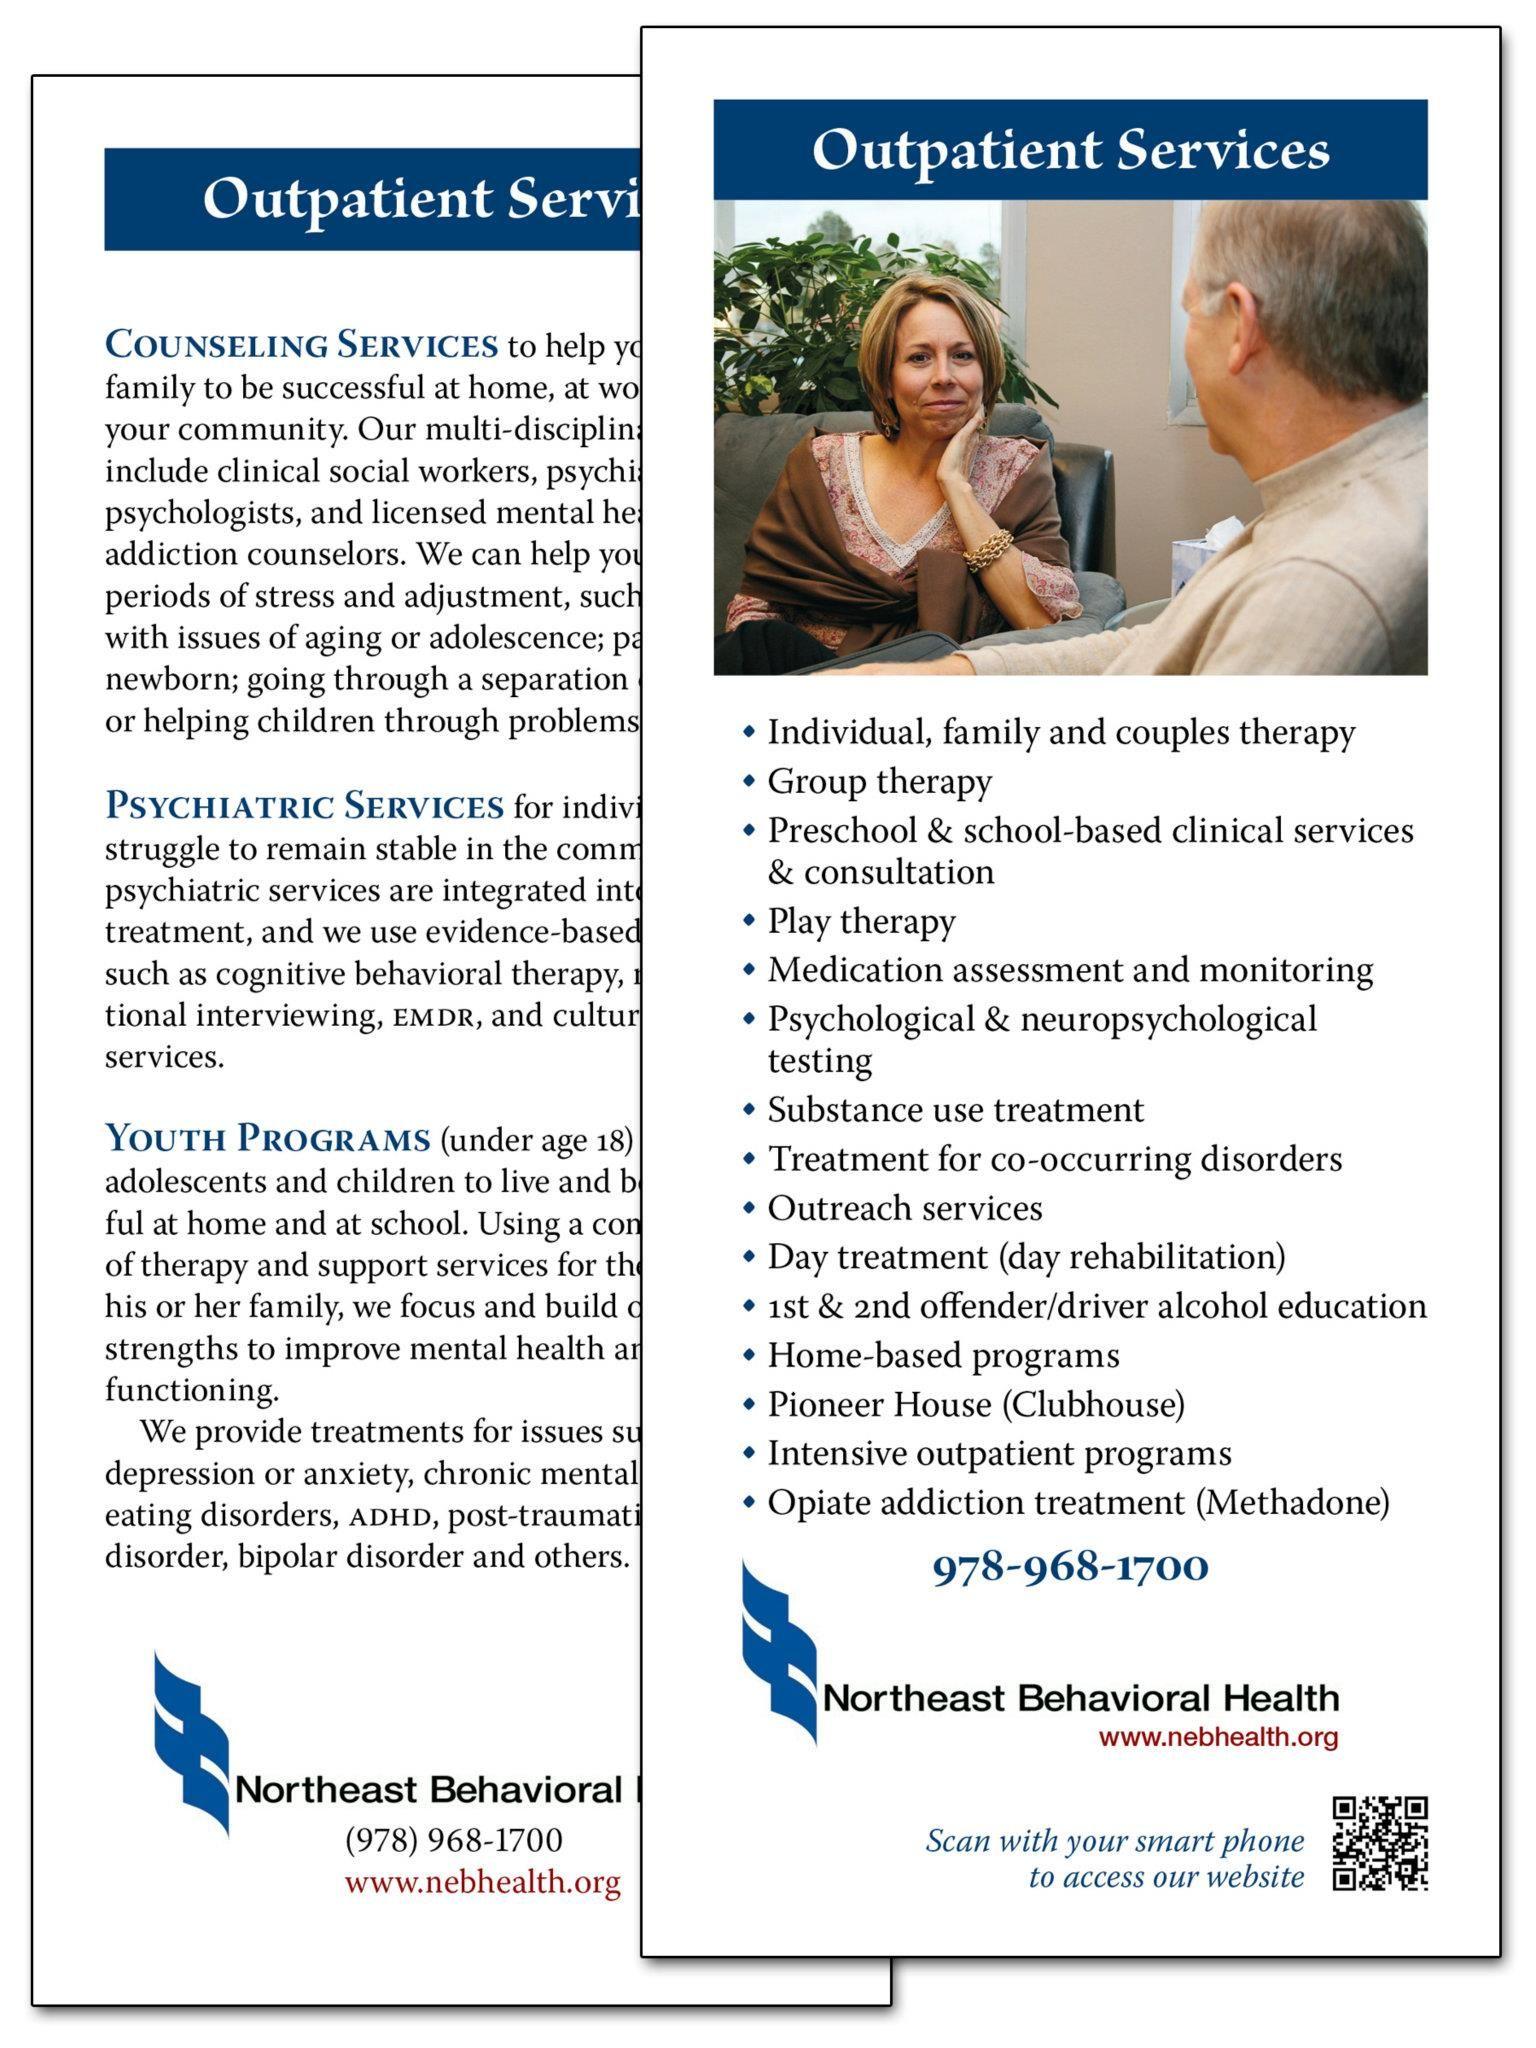 Northeast Behavioral Health - Rack Card | Business Cards